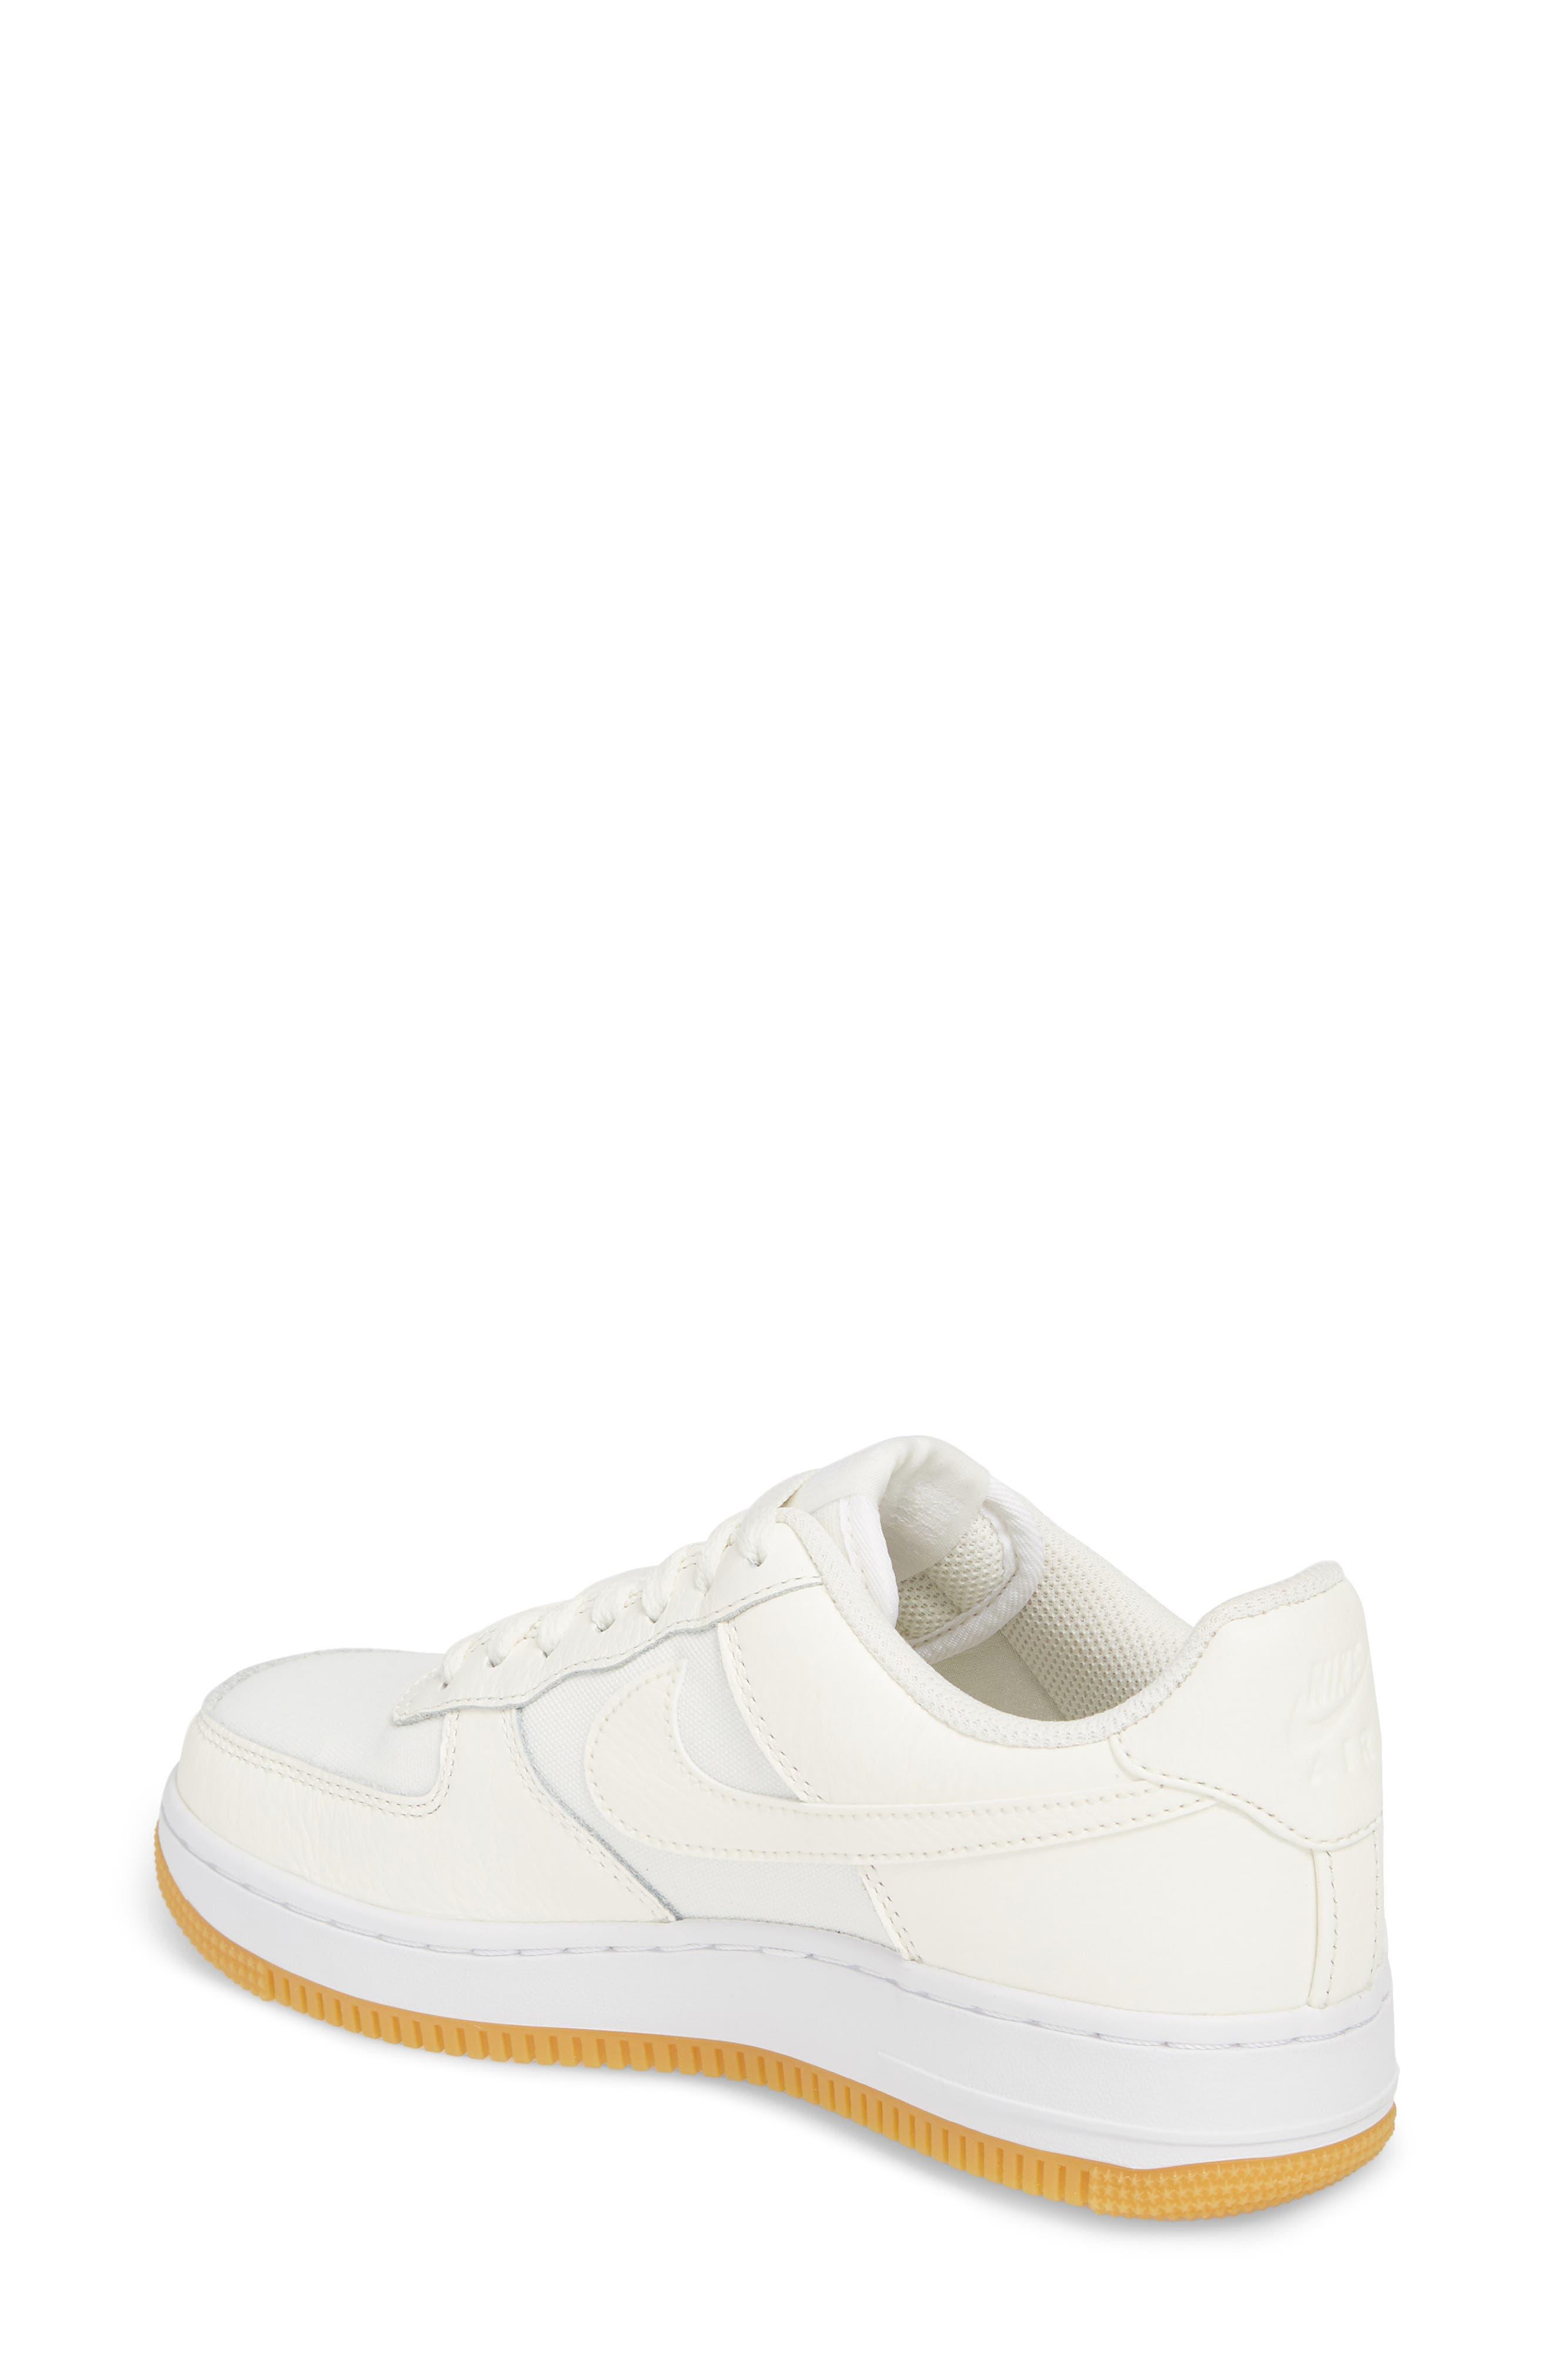 Air Force 1 '07 Premium Sneaker,                             Alternate thumbnail 2, color,                             Sail/ White/ Light Brown